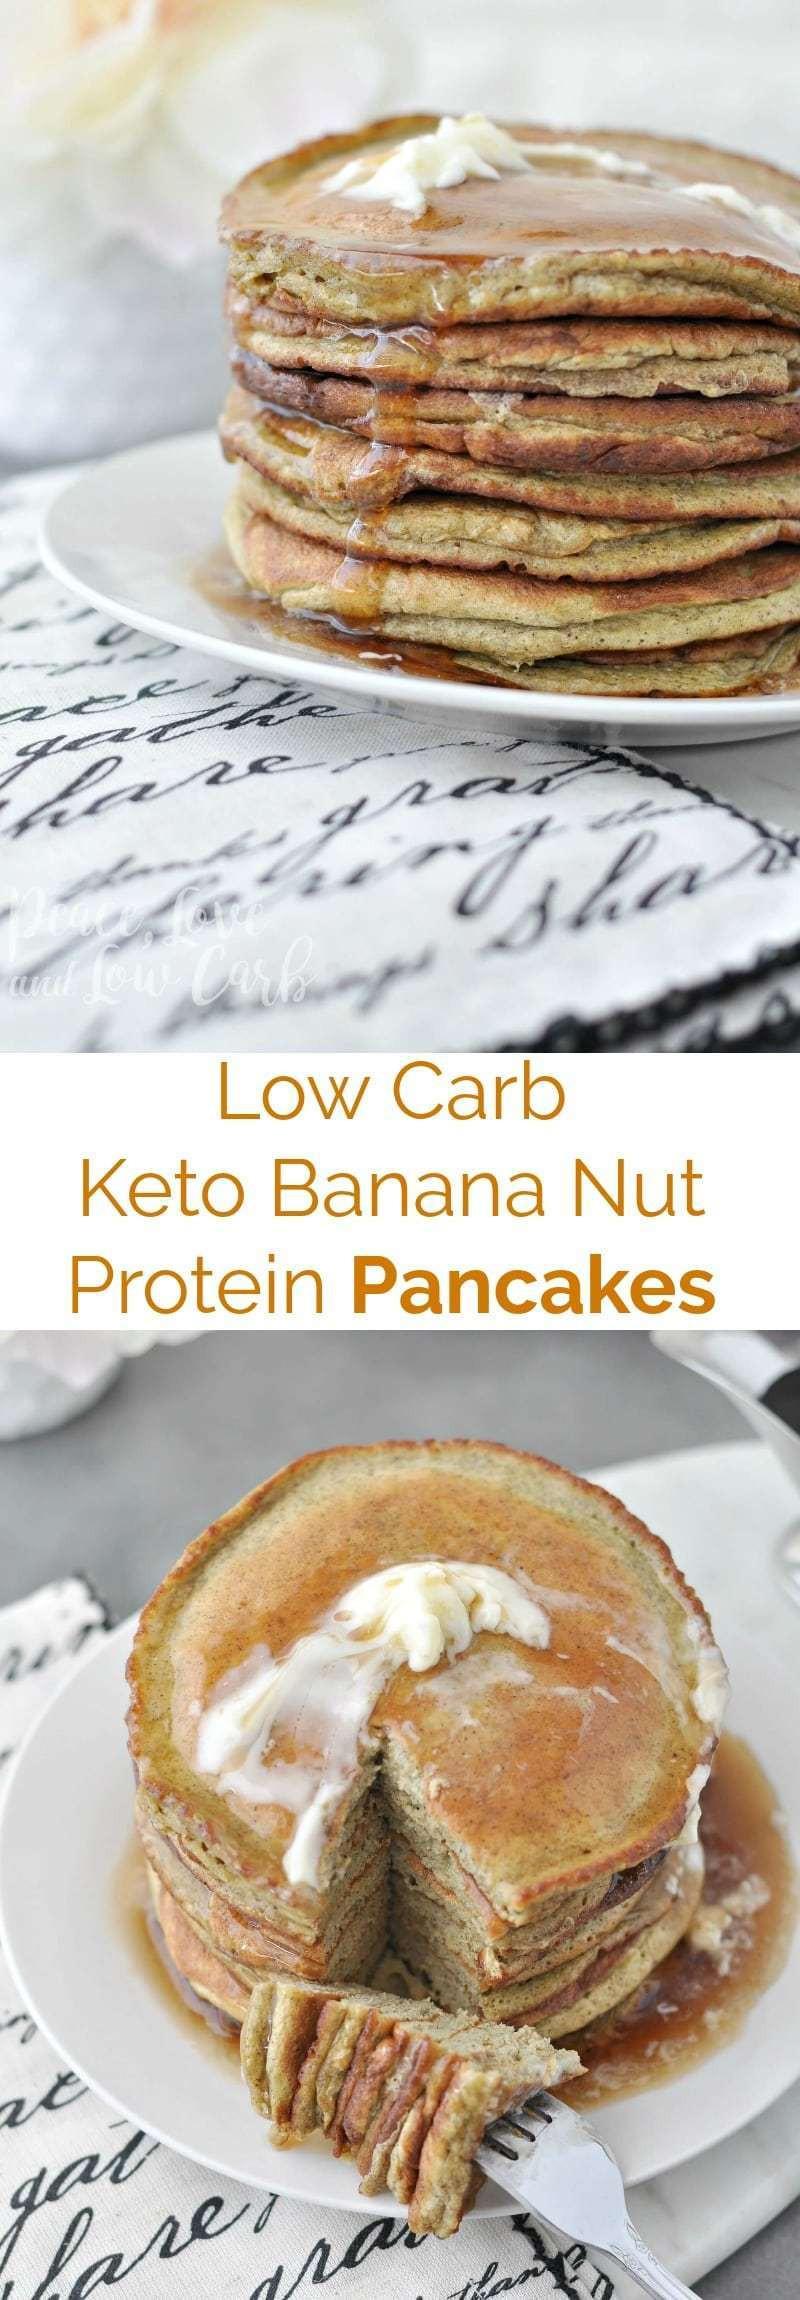 Protein Pancakes Low Carb  Low Carb Keto Banana Nut Protein Pancakes